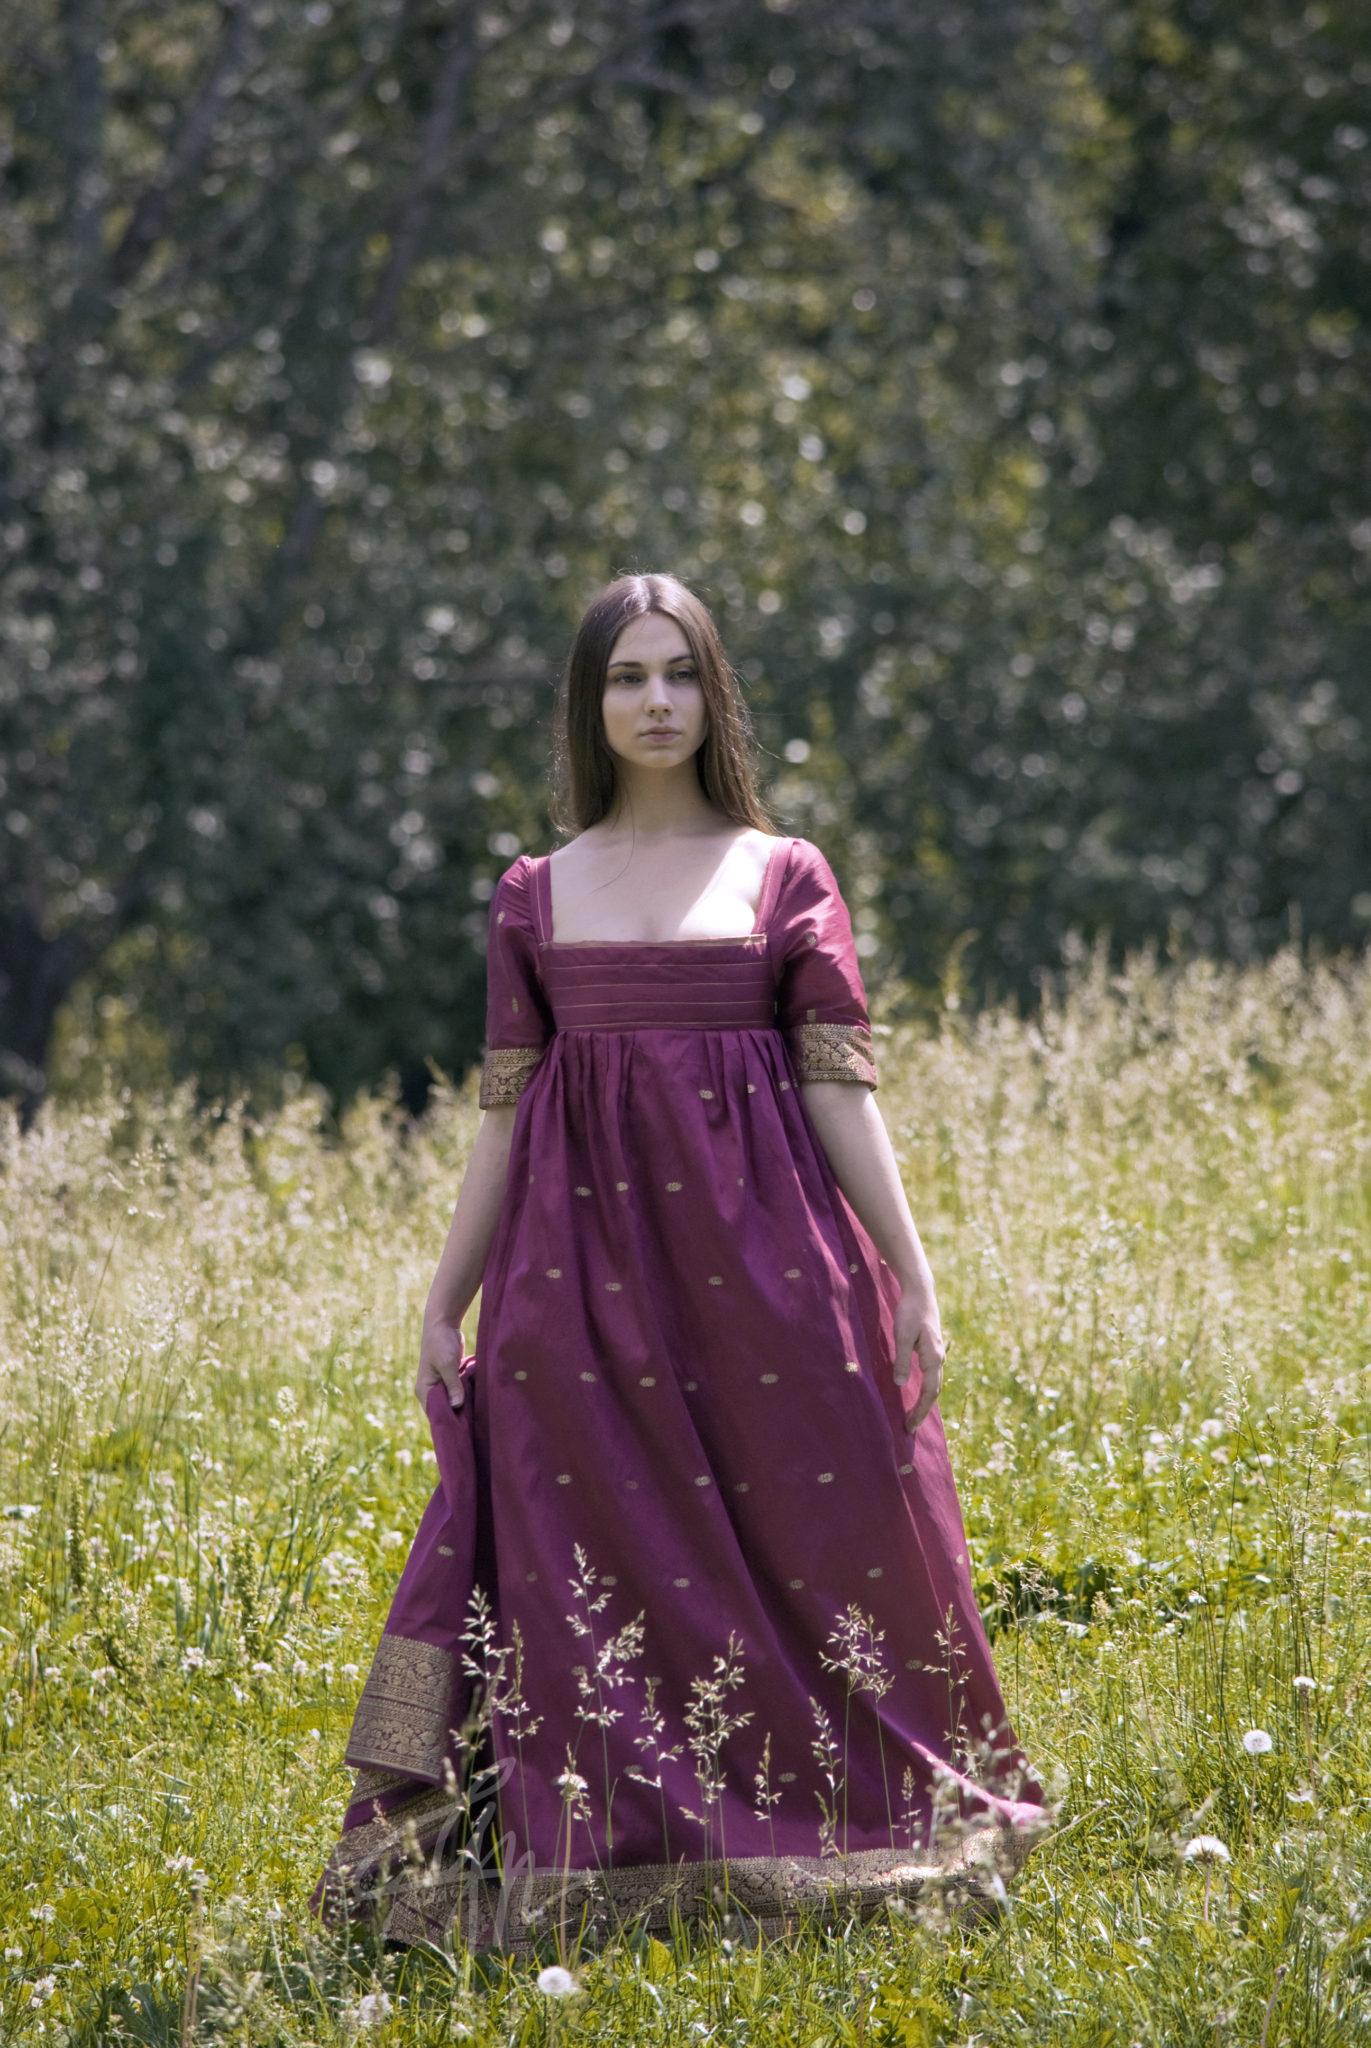 Vanity Fair, a regency inspired dress - Grimilde Malatesta